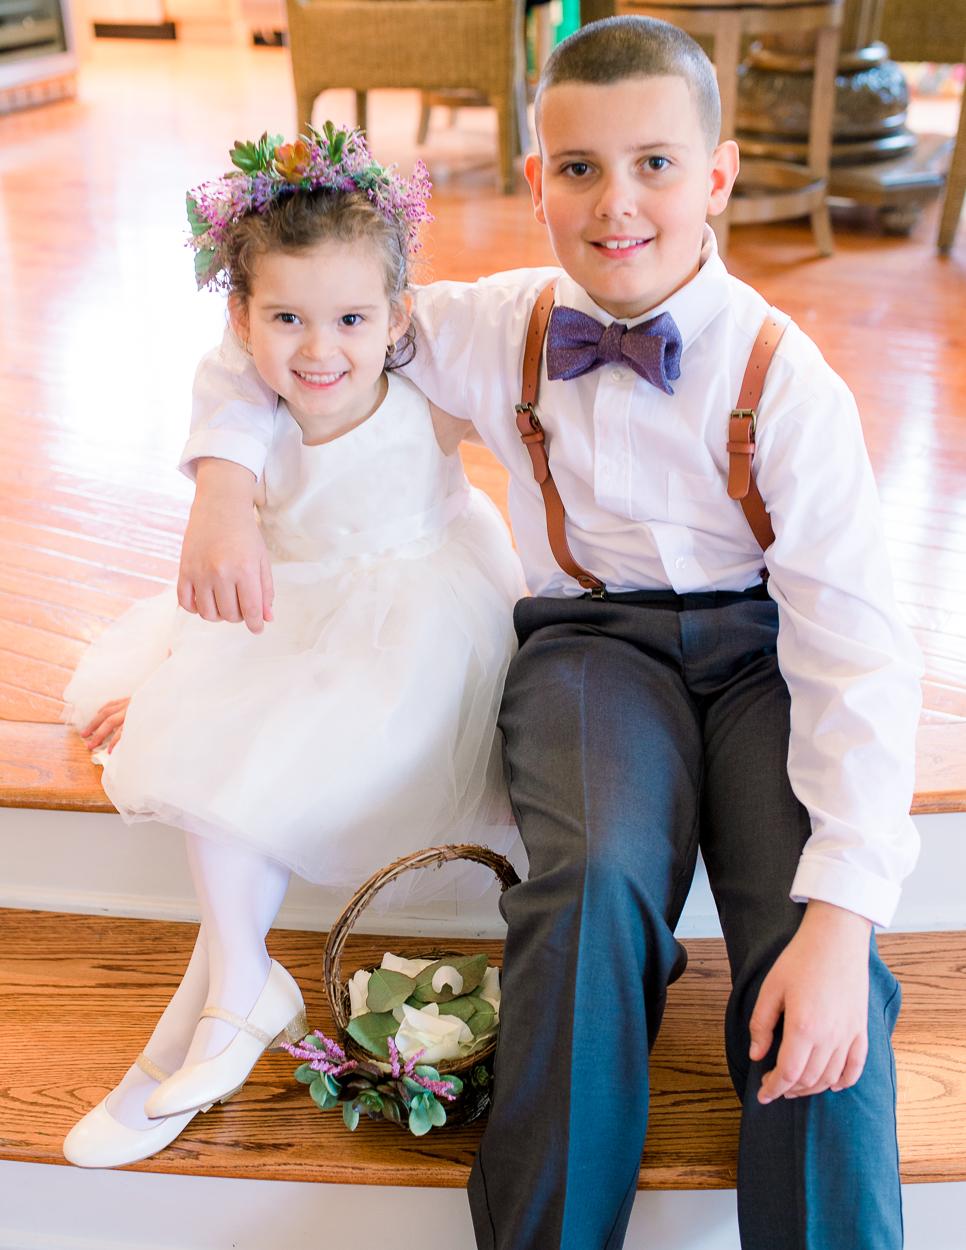 BigCork_vineyard wedding_virginiaweddingphotographer_youseephotography_SarahJames (31).JPG